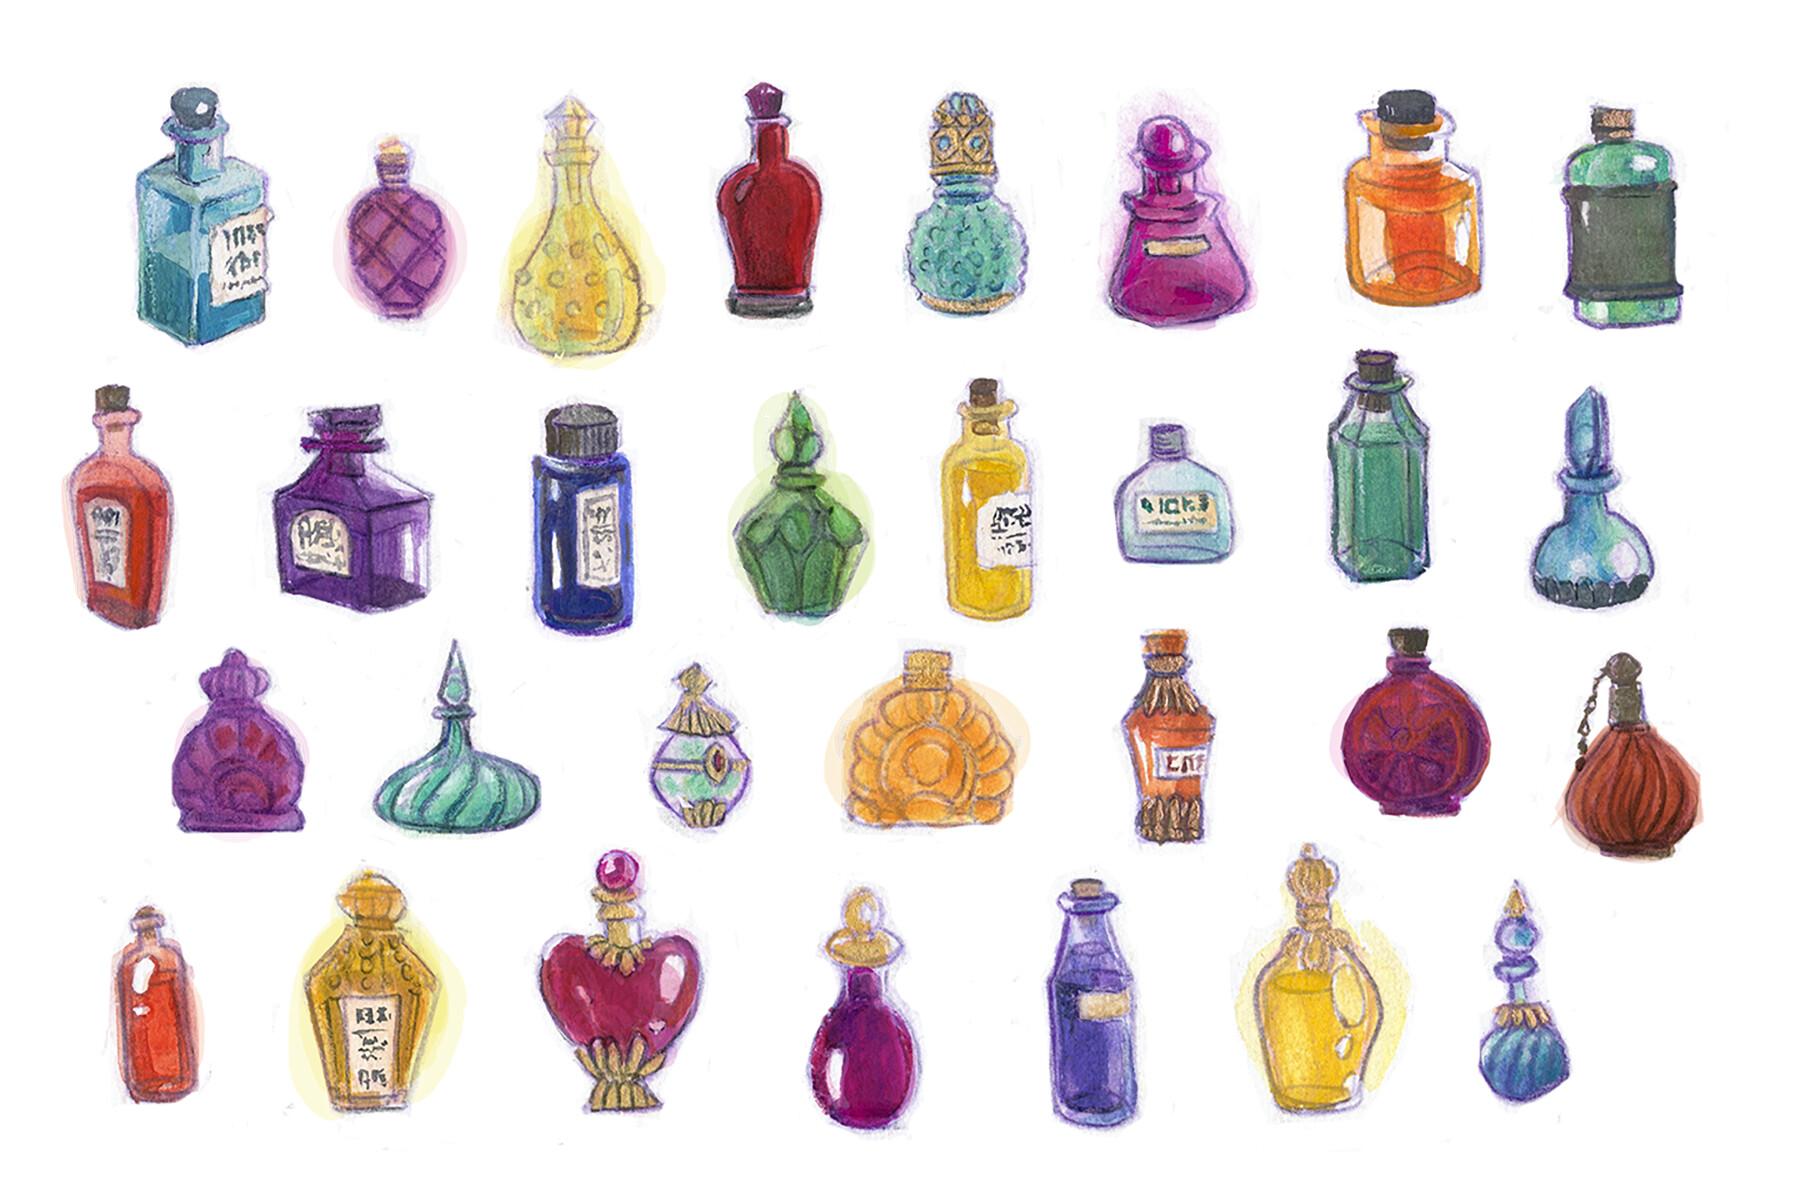 Tara williamson potions